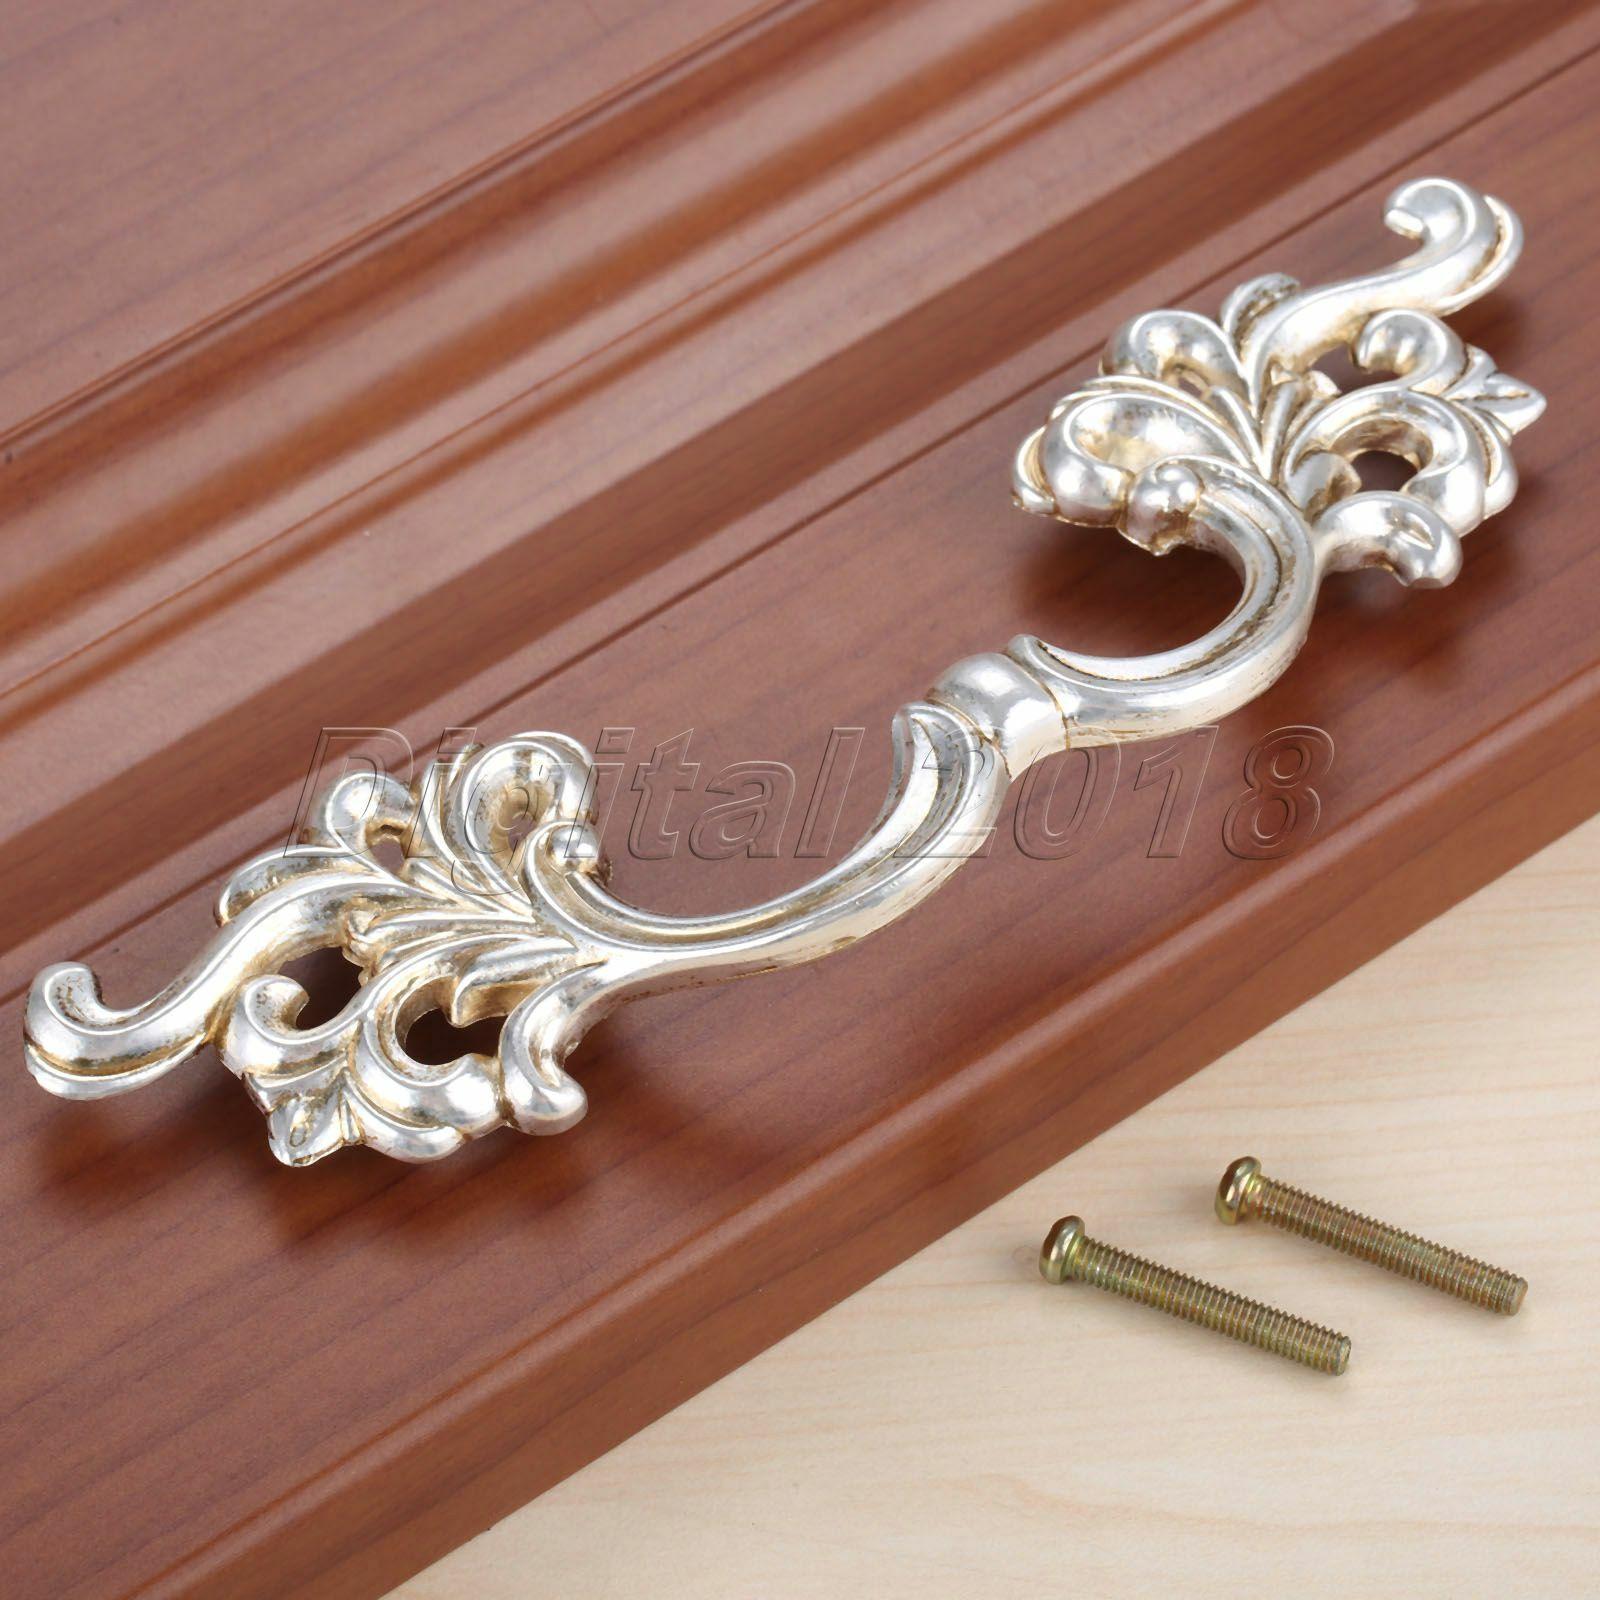 1Pc European Style Vintage Dresser Cupboard Closet Drawer Handle Pulls Cabinet Door Knob Furniture Hardware Antique Silver